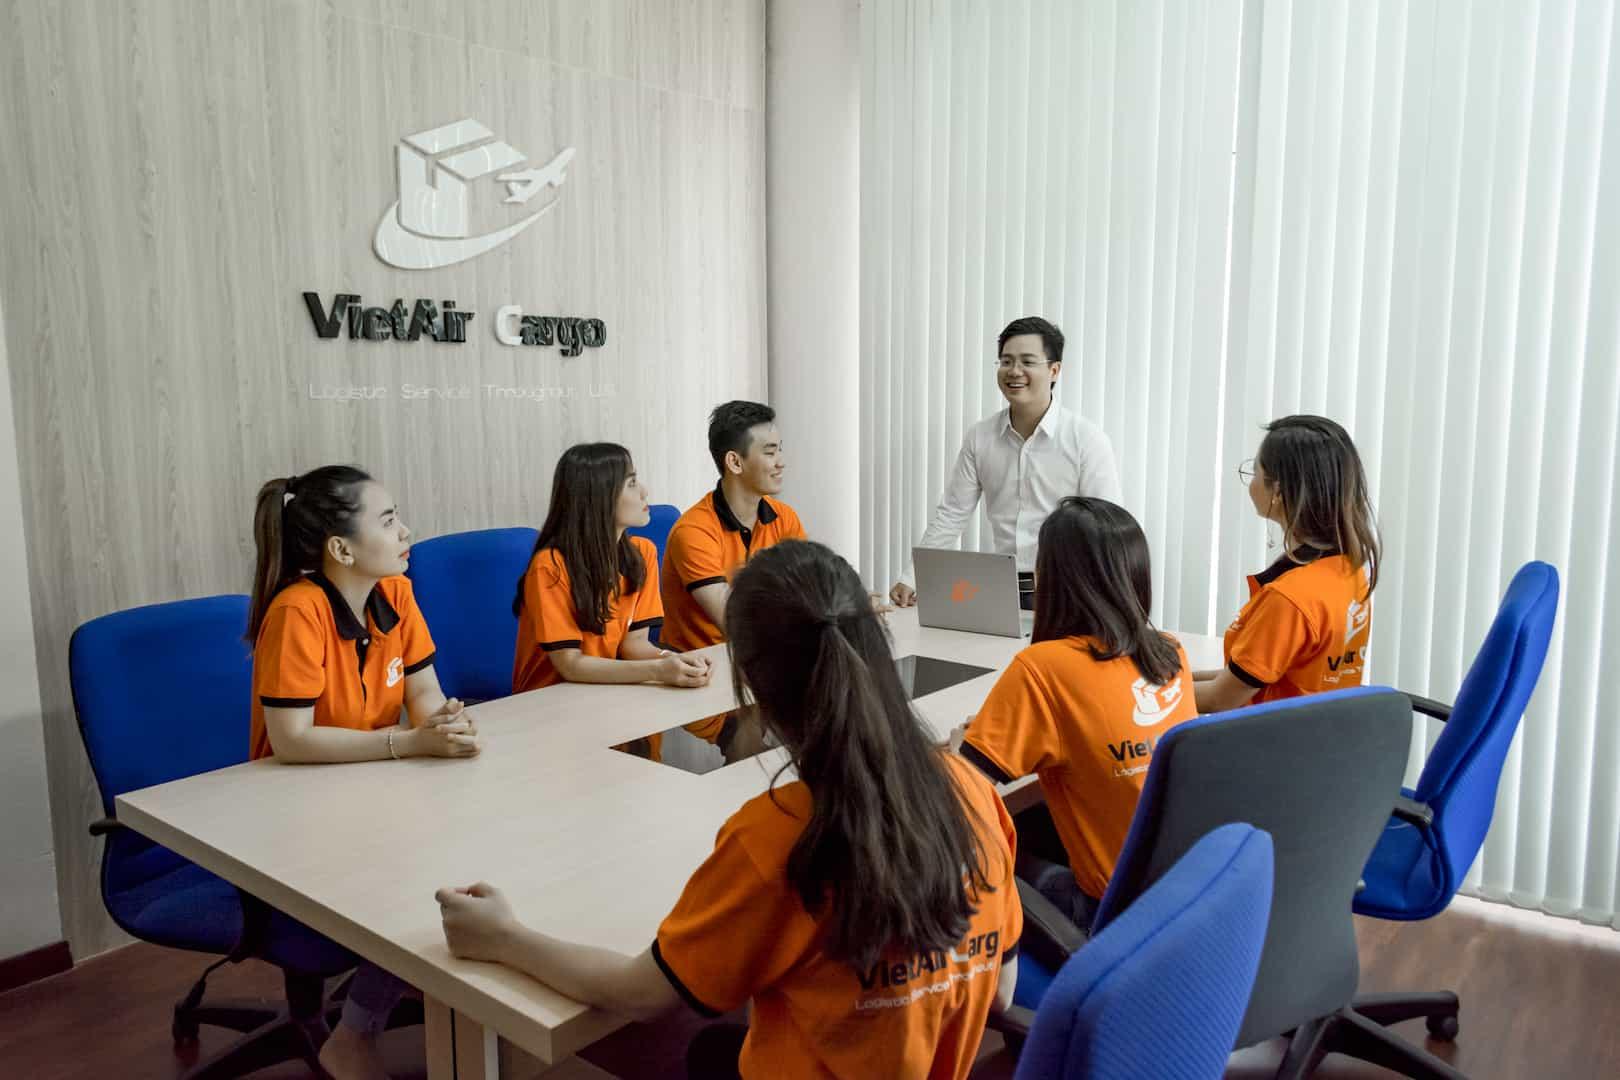 nhung-ly-do-ban-nen-su-dung-dich-vu-cua-vietair-cargo-2 Tại sao bạn nên chọn dịch vụ của VietAir Cargo?